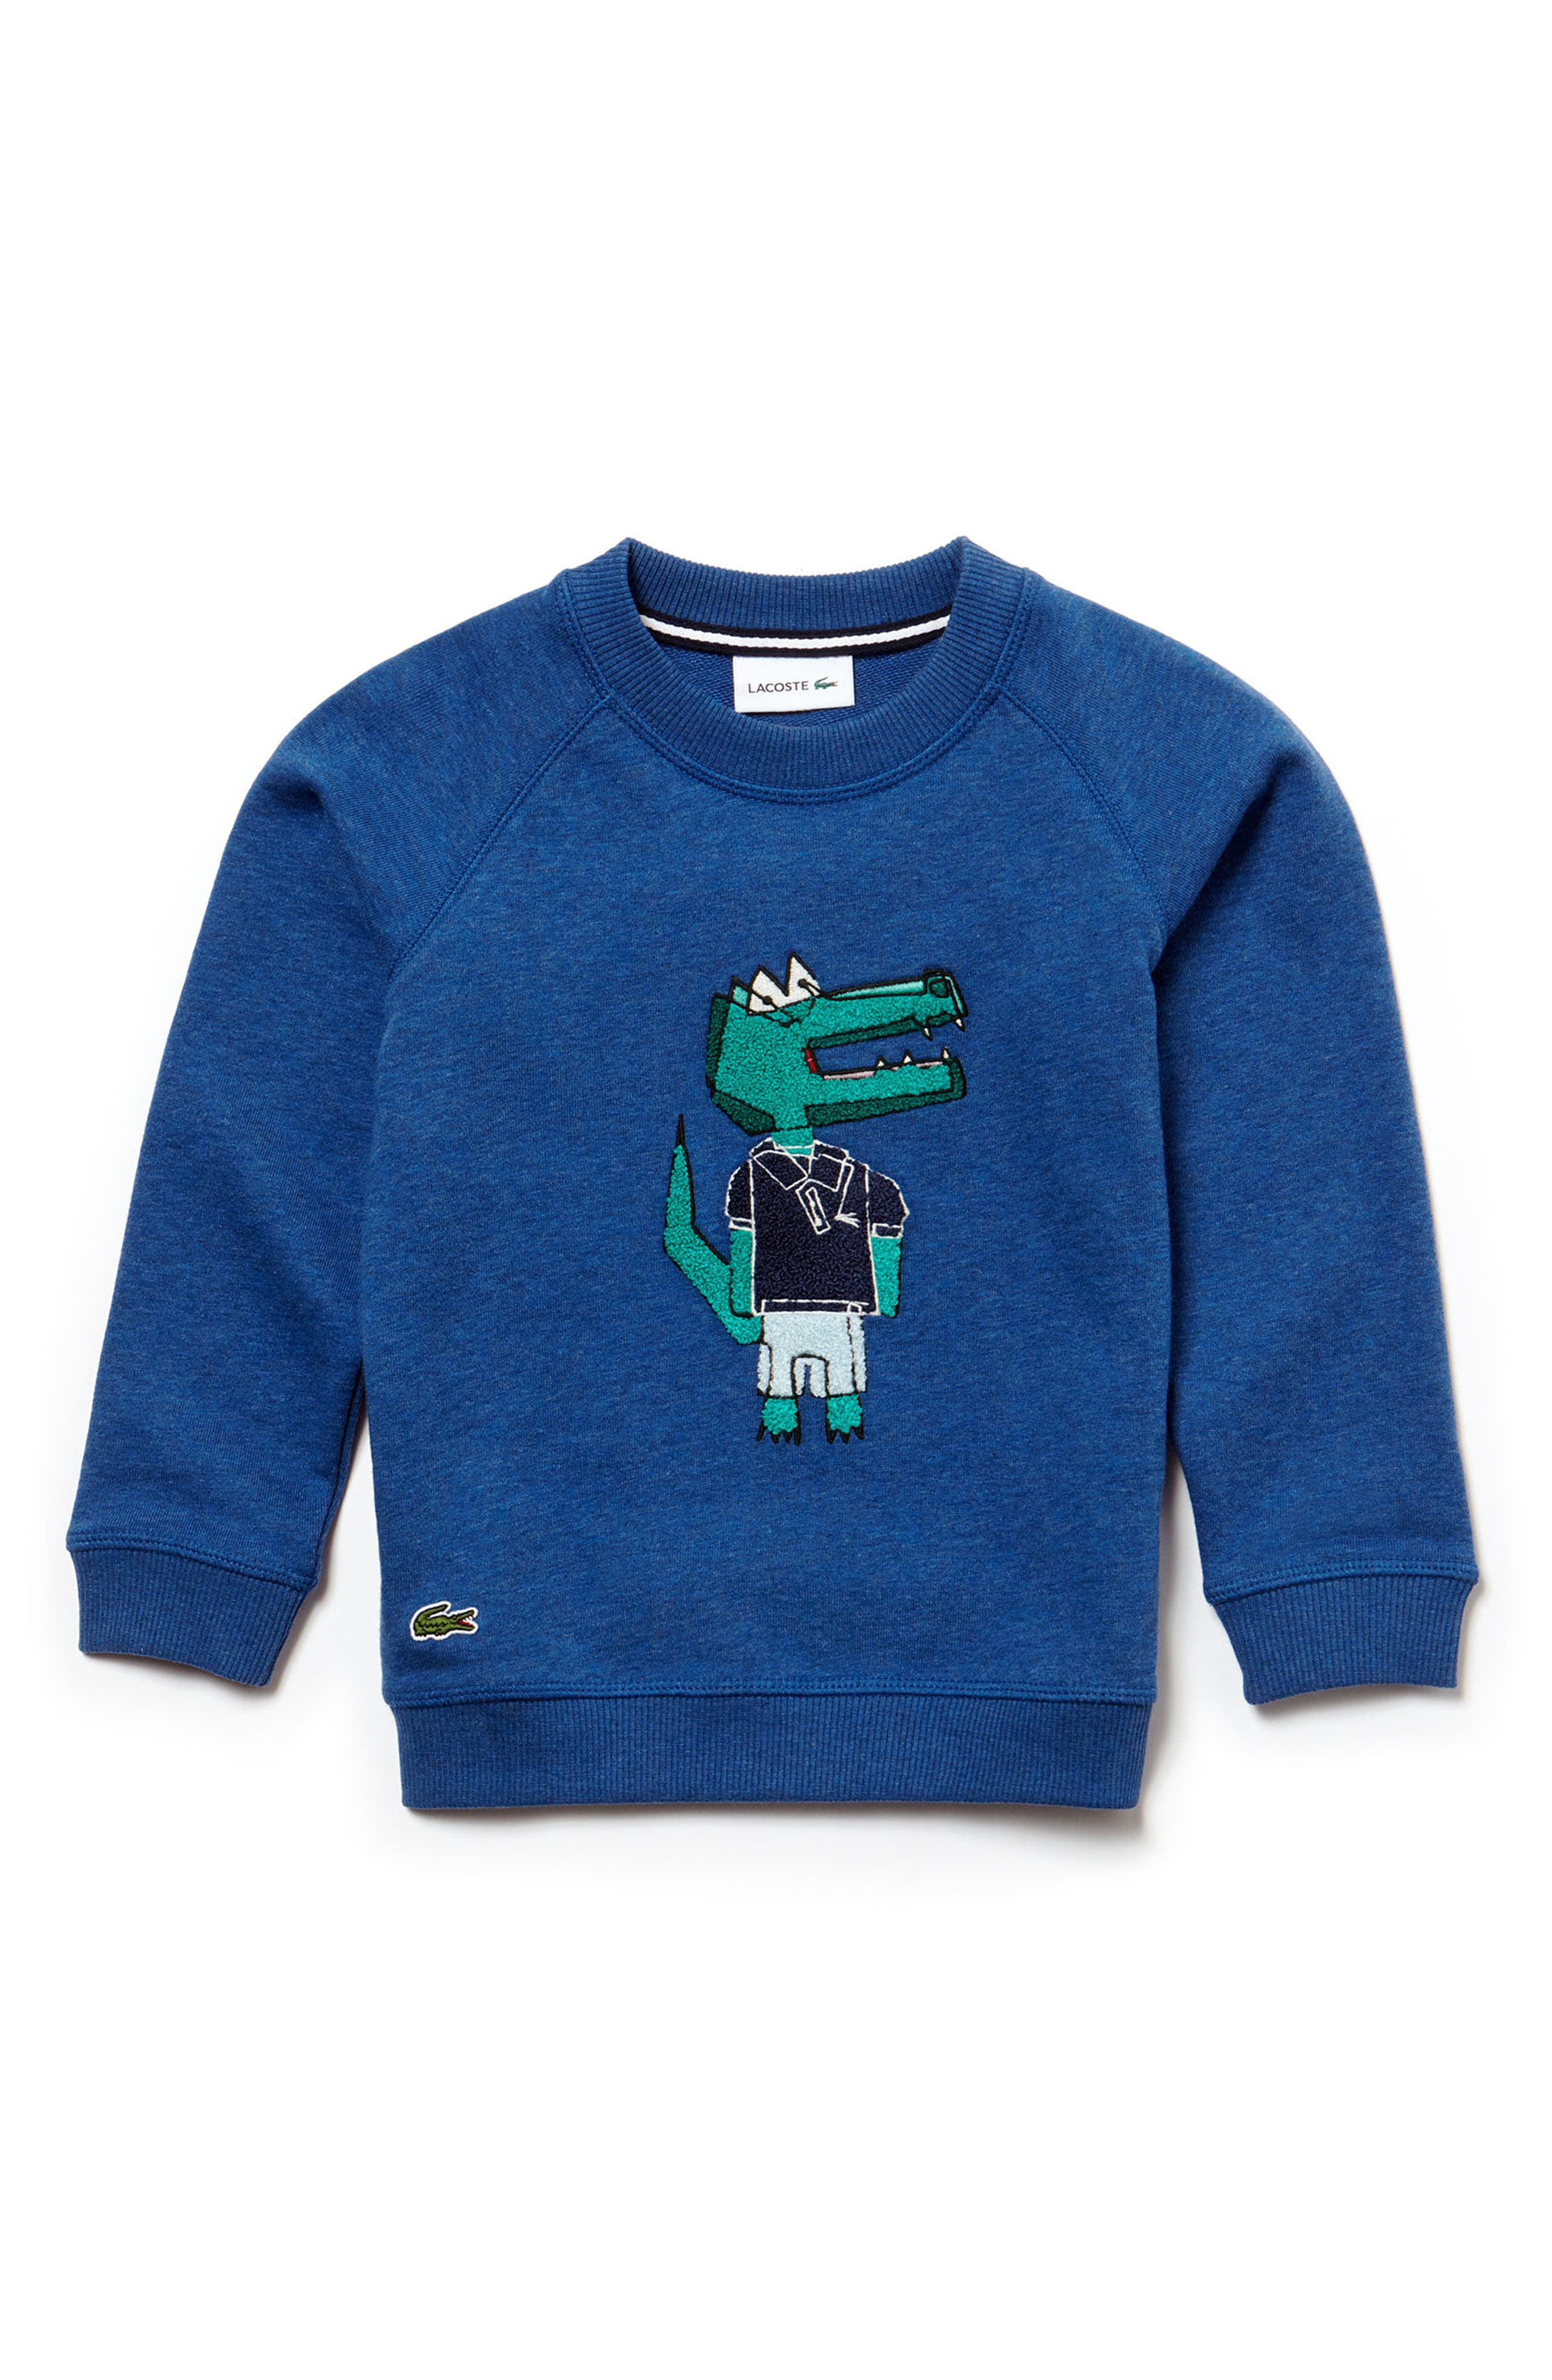 Crocodile Sweater,                         Main,                         color, 400